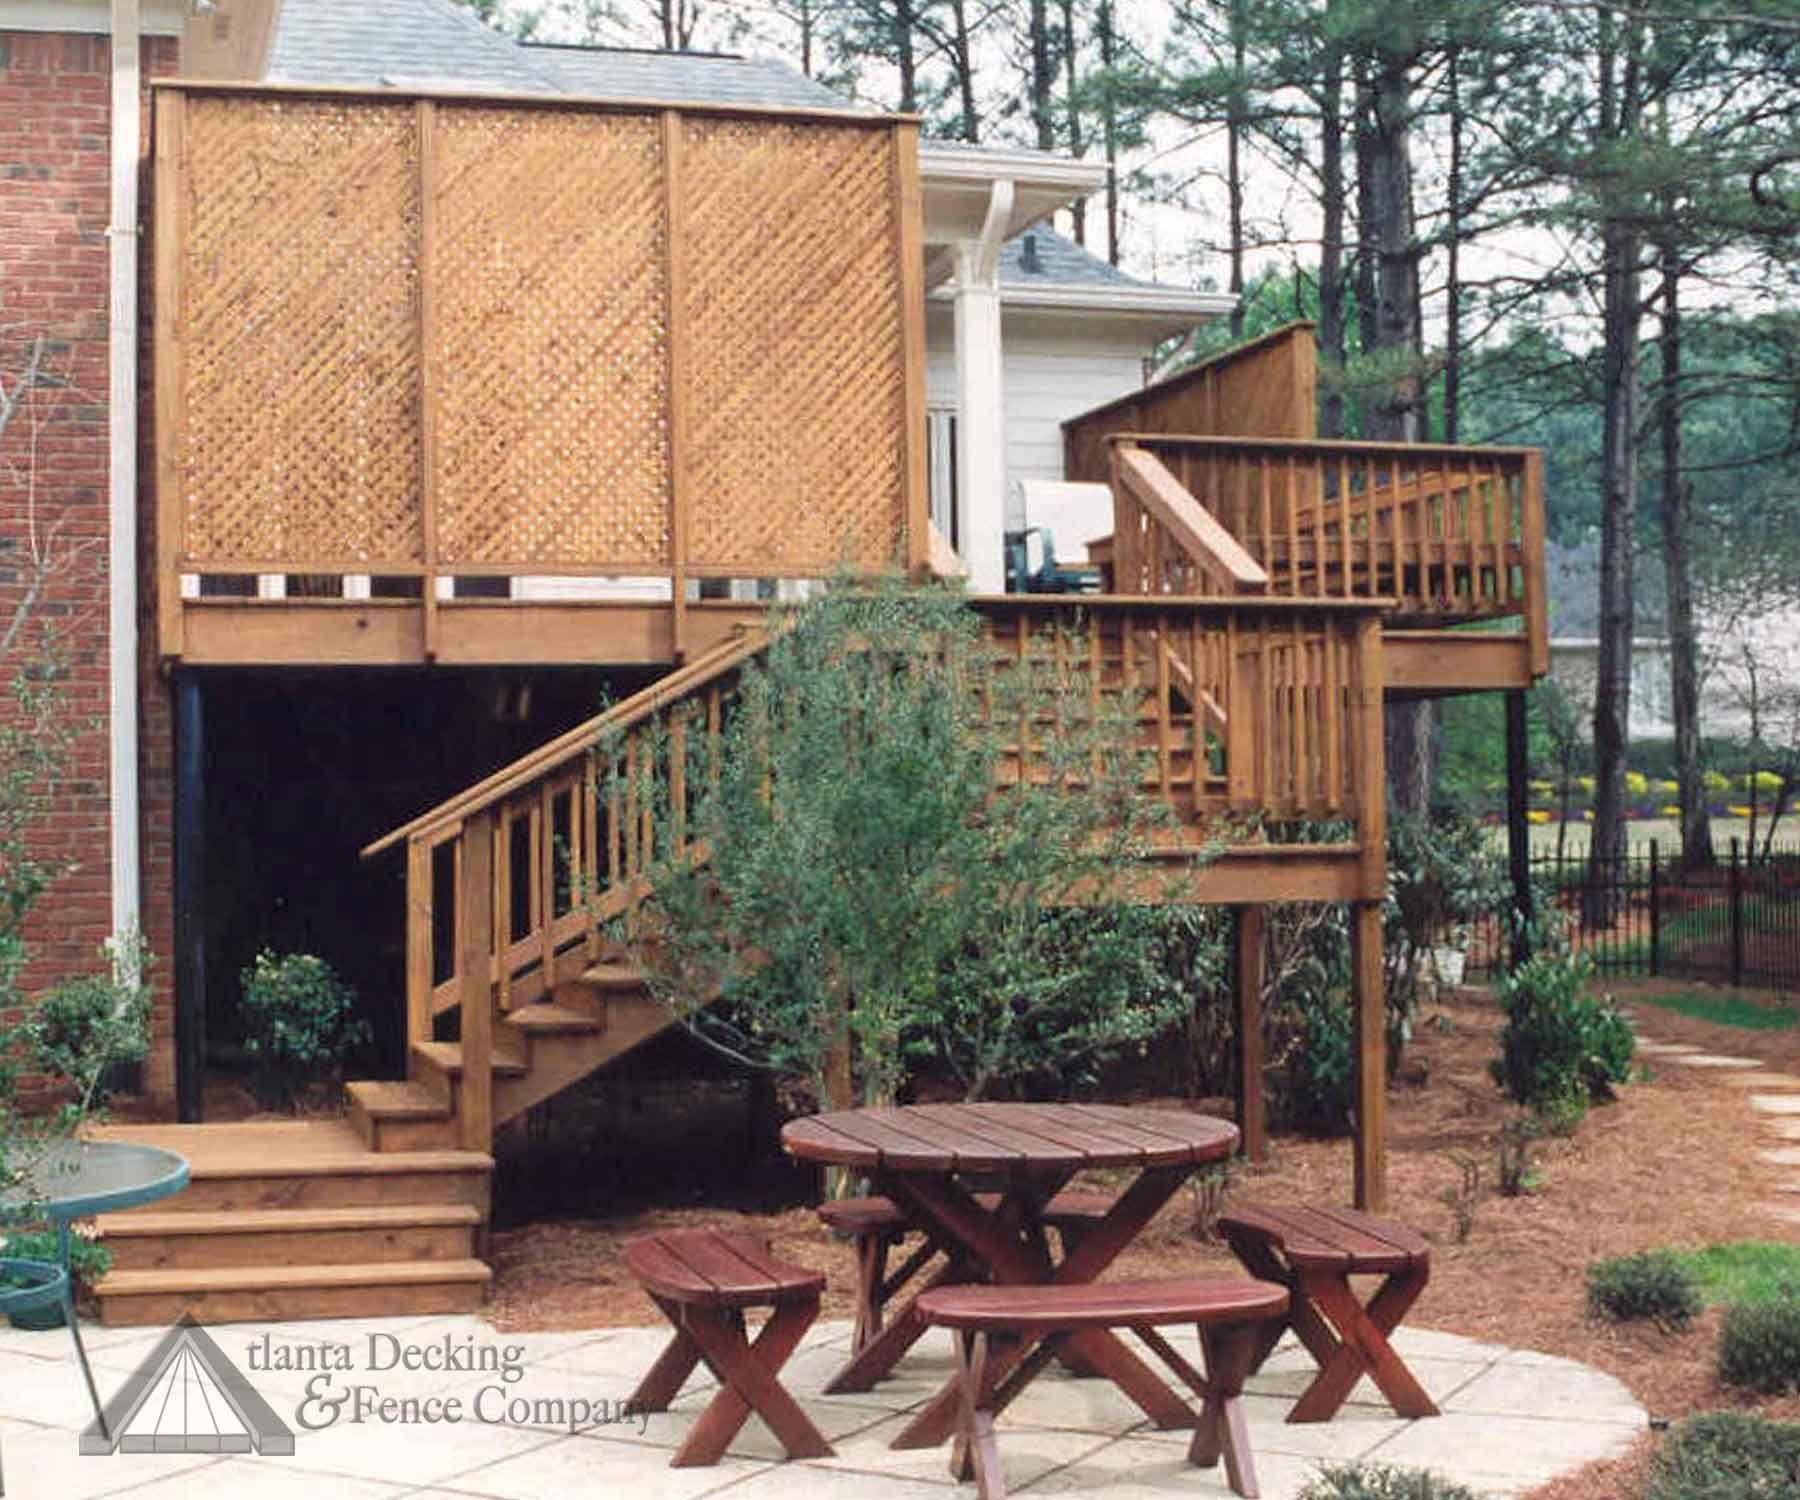 Pin By Atlanta Decking & Fence On Fancy Fences